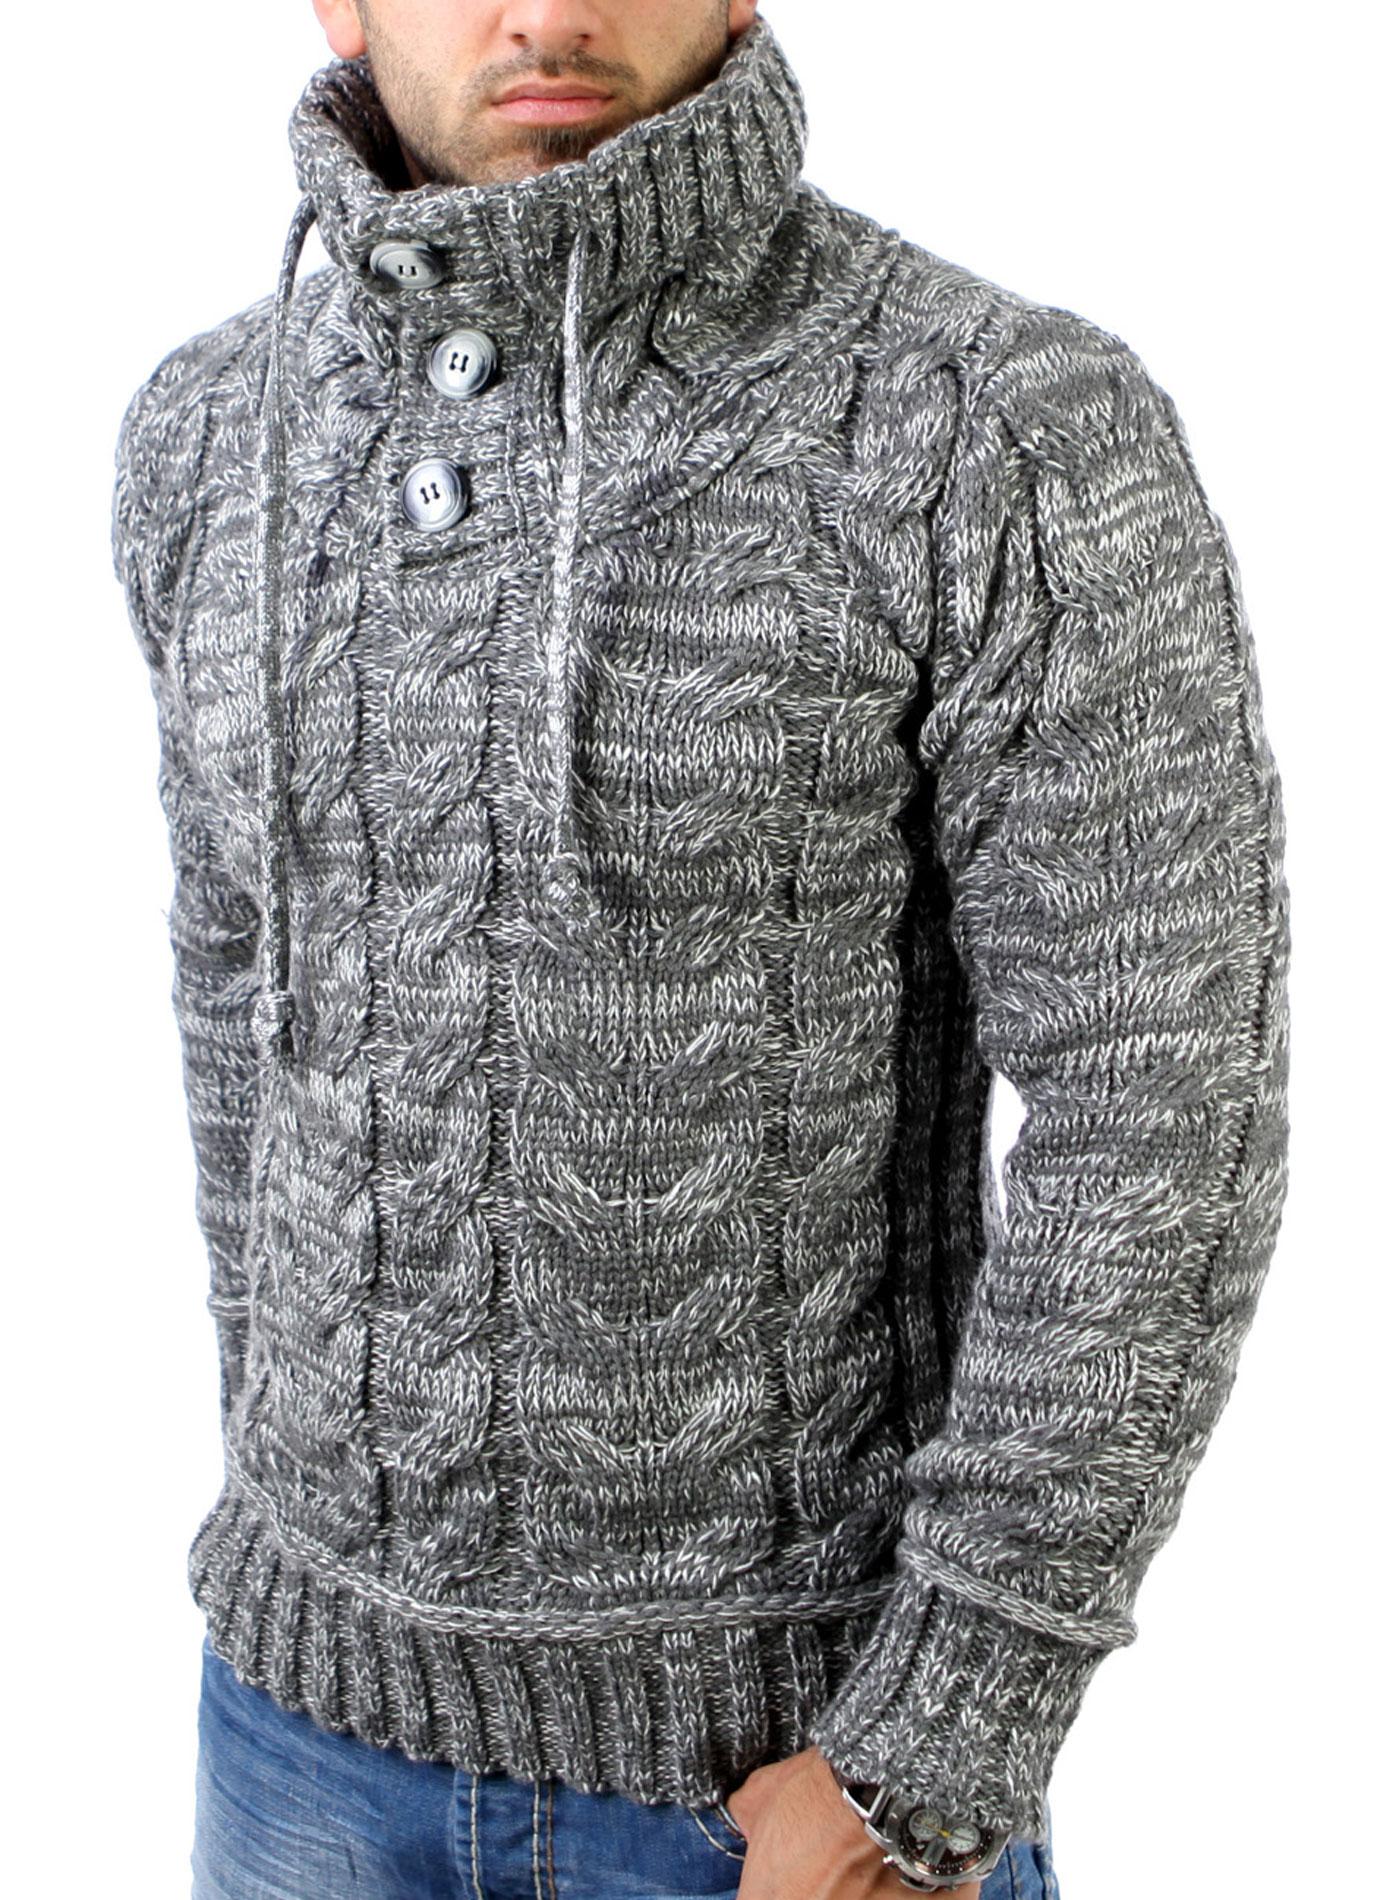 reslad herren hoher kragen strickpullover sweat jacke winter pullover rs 3960 ebay. Black Bedroom Furniture Sets. Home Design Ideas